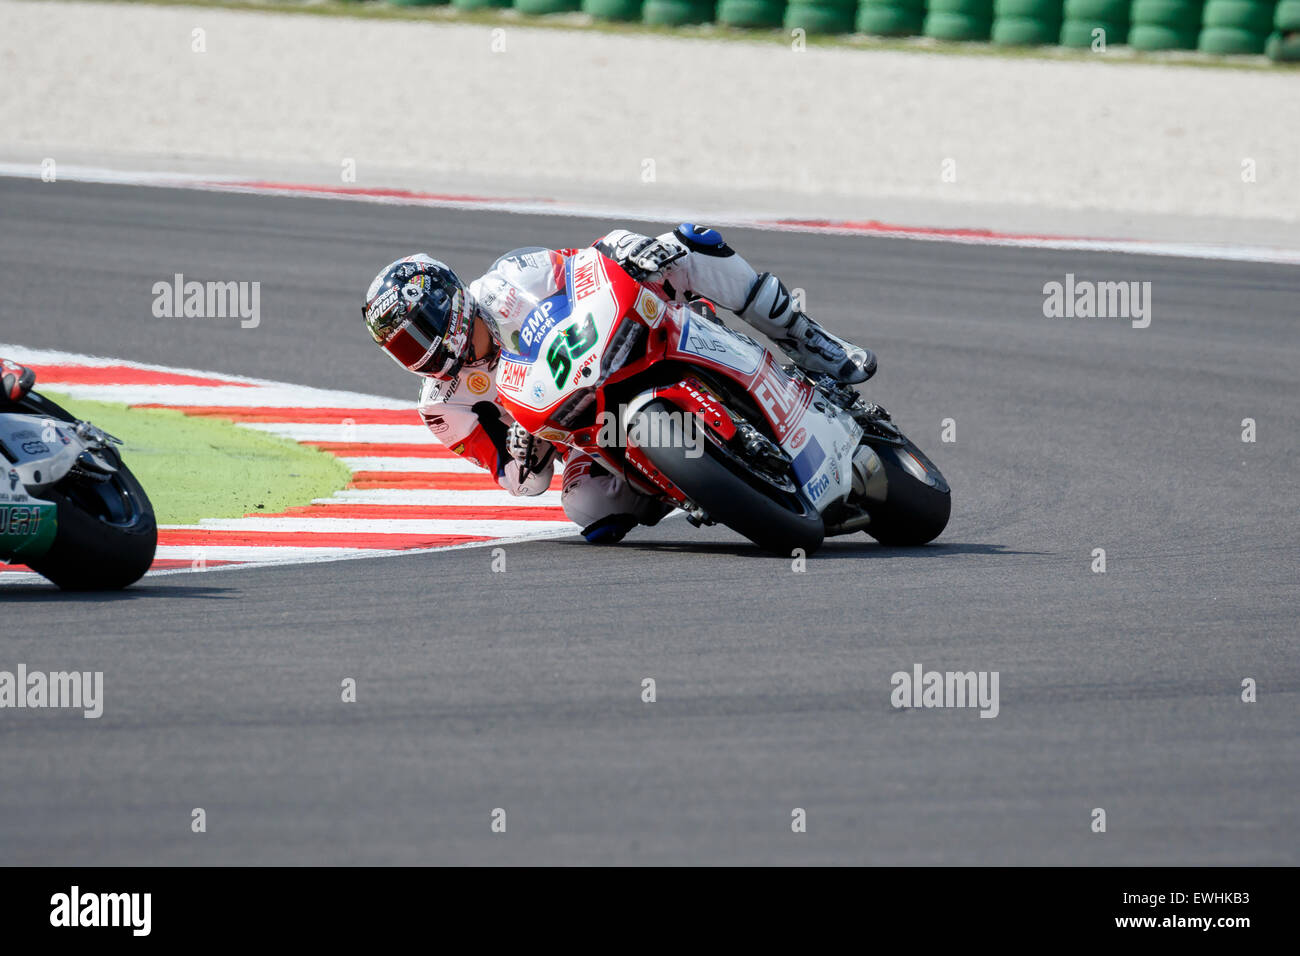 Misano Adriatico, Italy - June 20, 2015: Ducati Panigale R of Althea Racing Team, driven by CANEPA Niccolò Stock Photo